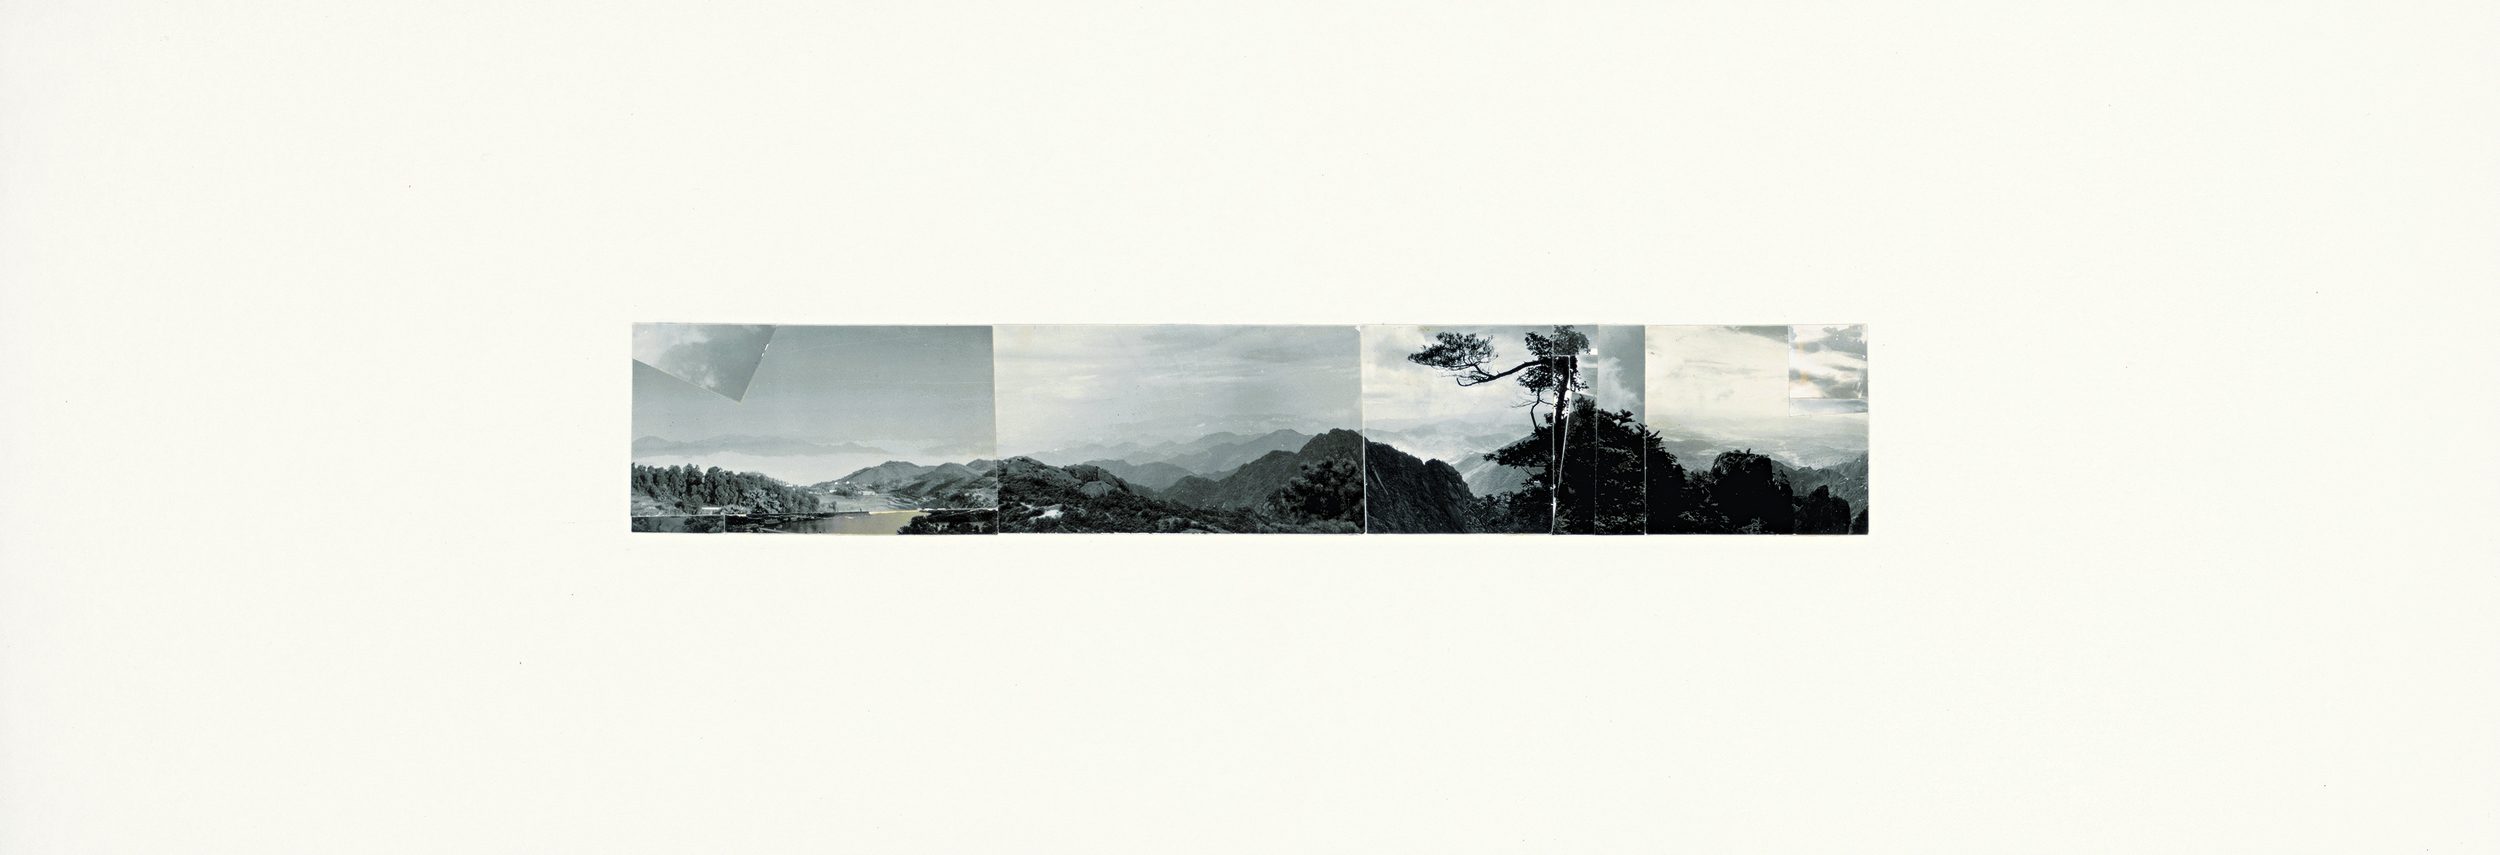 Ni Youyu 倪有鱼, Freewheeling Trip Ⅰ 逍遥游 1, 2011 - 2012, Collage 拼贴, 20 × 60 cm